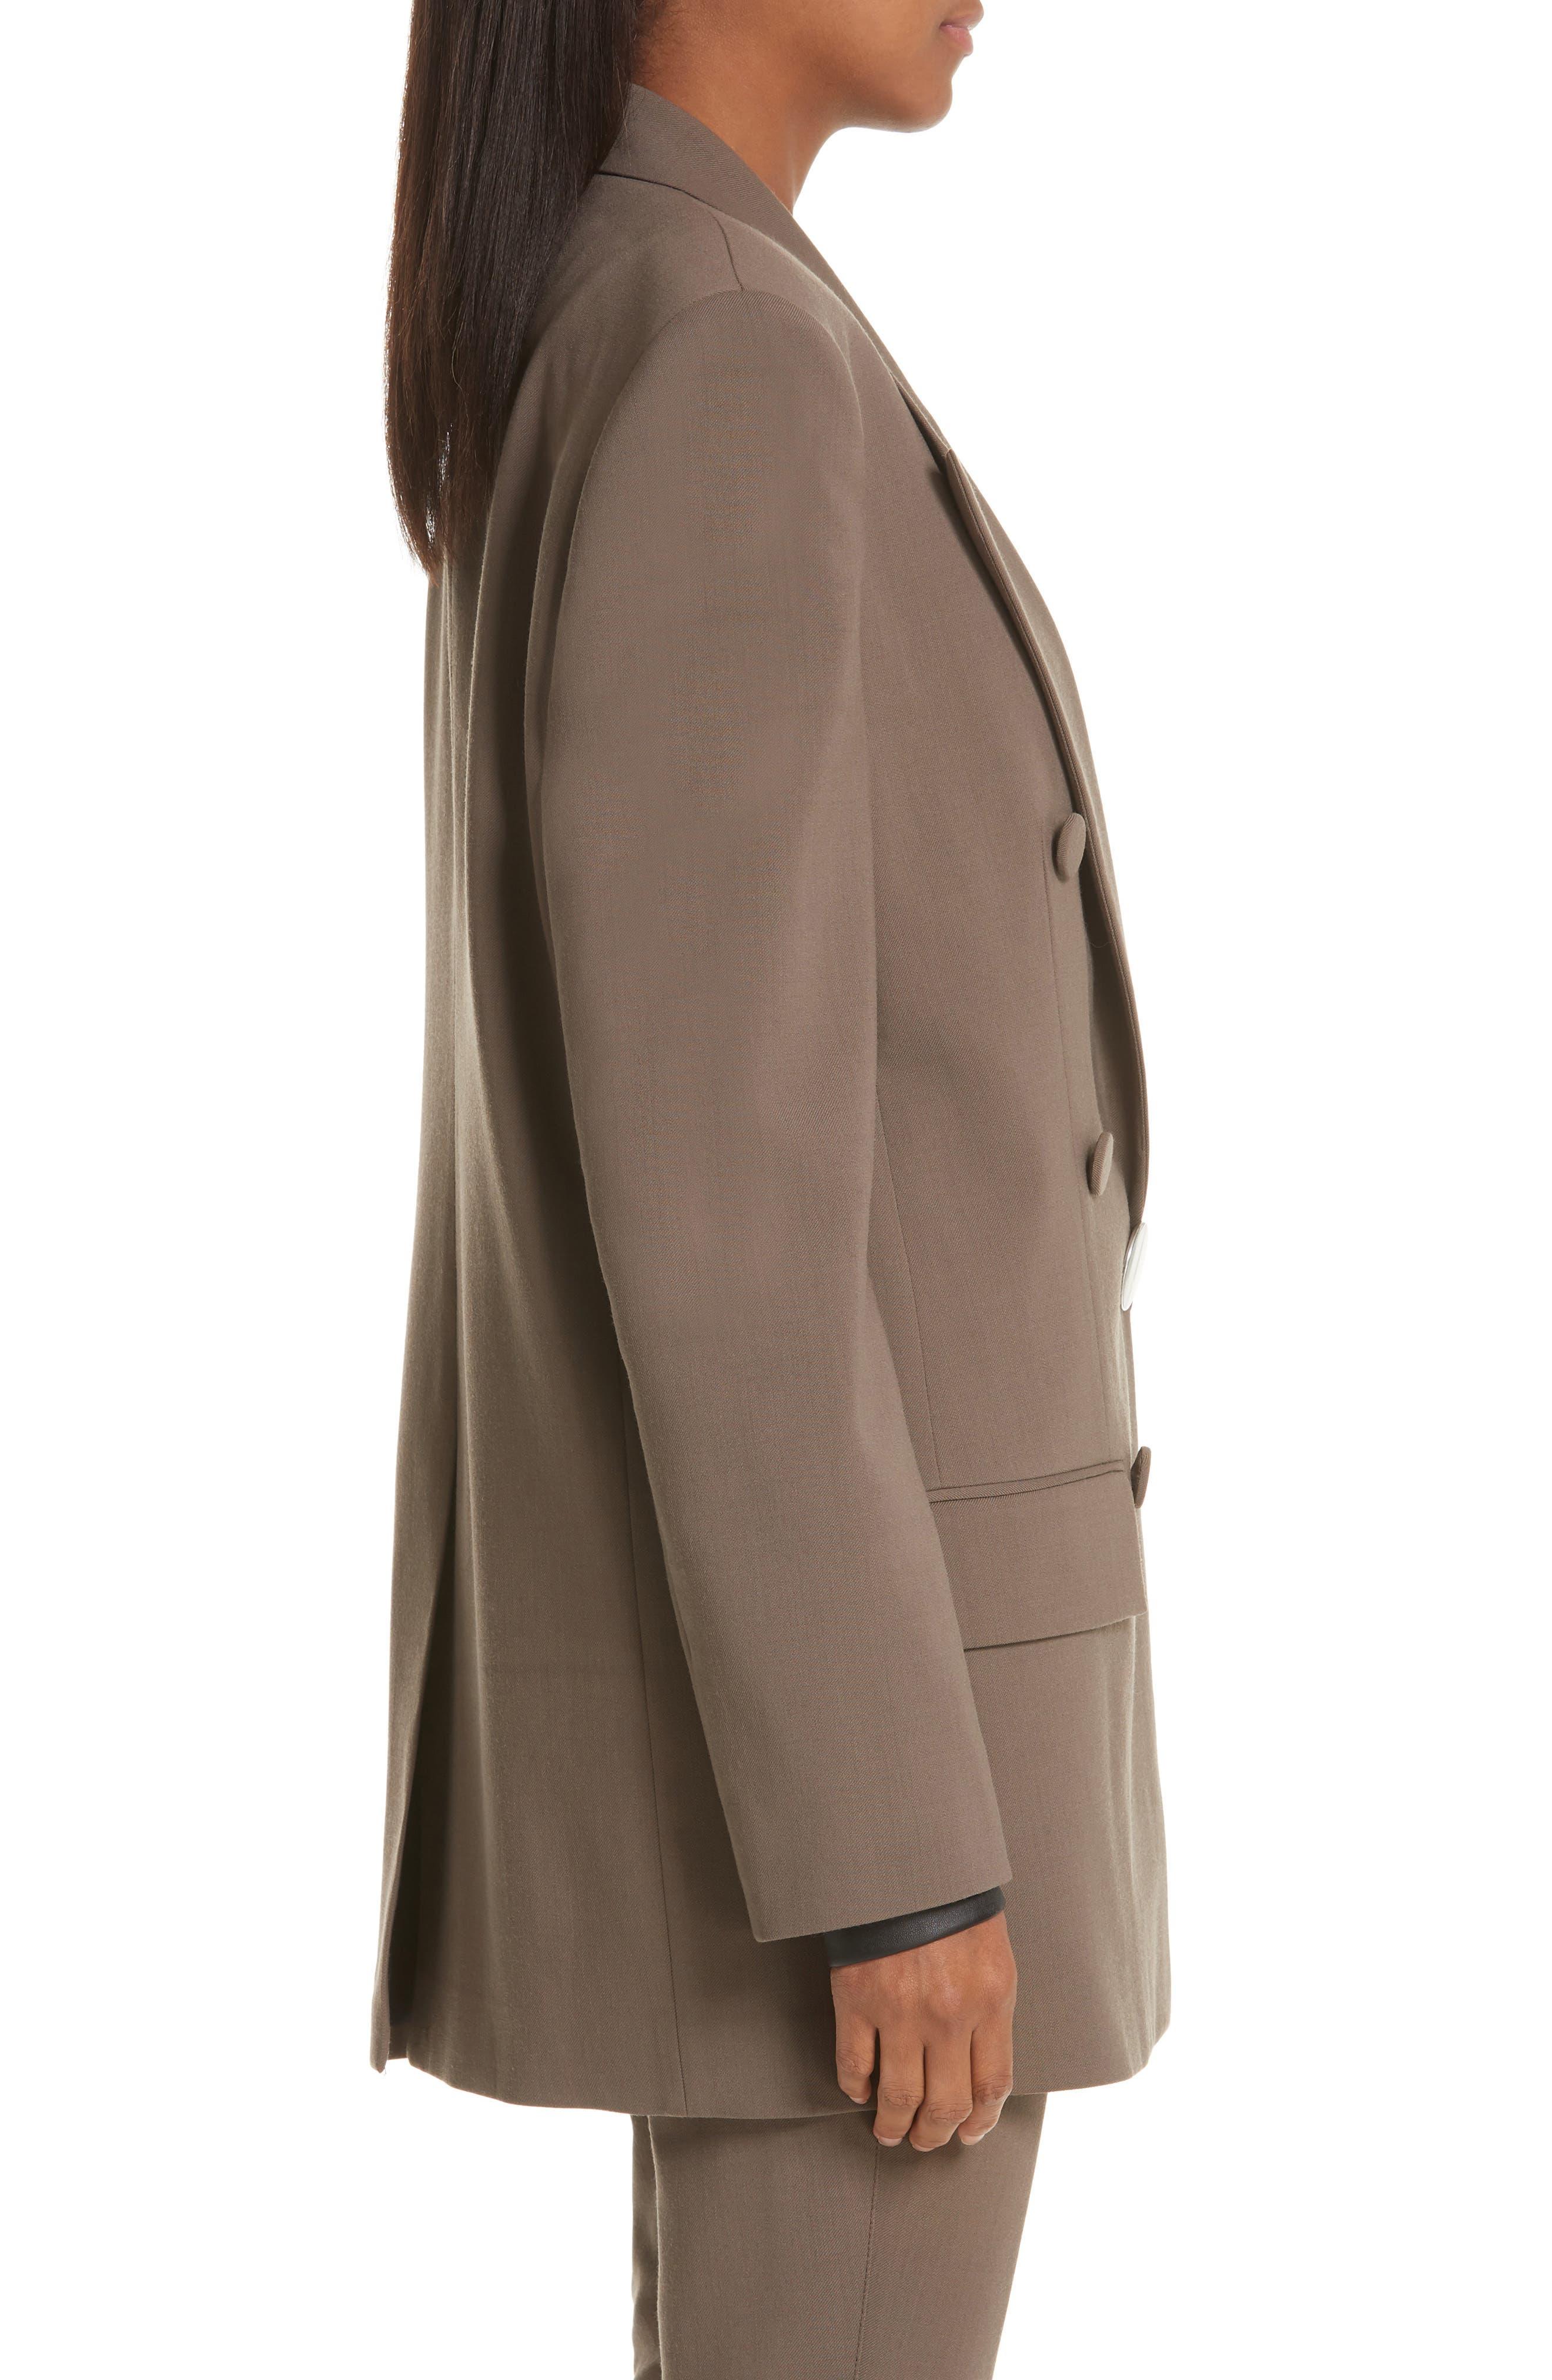 ALEXANDER WANG,                             Leather Cuff Blazer,                             Alternate thumbnail 4, color,                             KHAKI GREEN